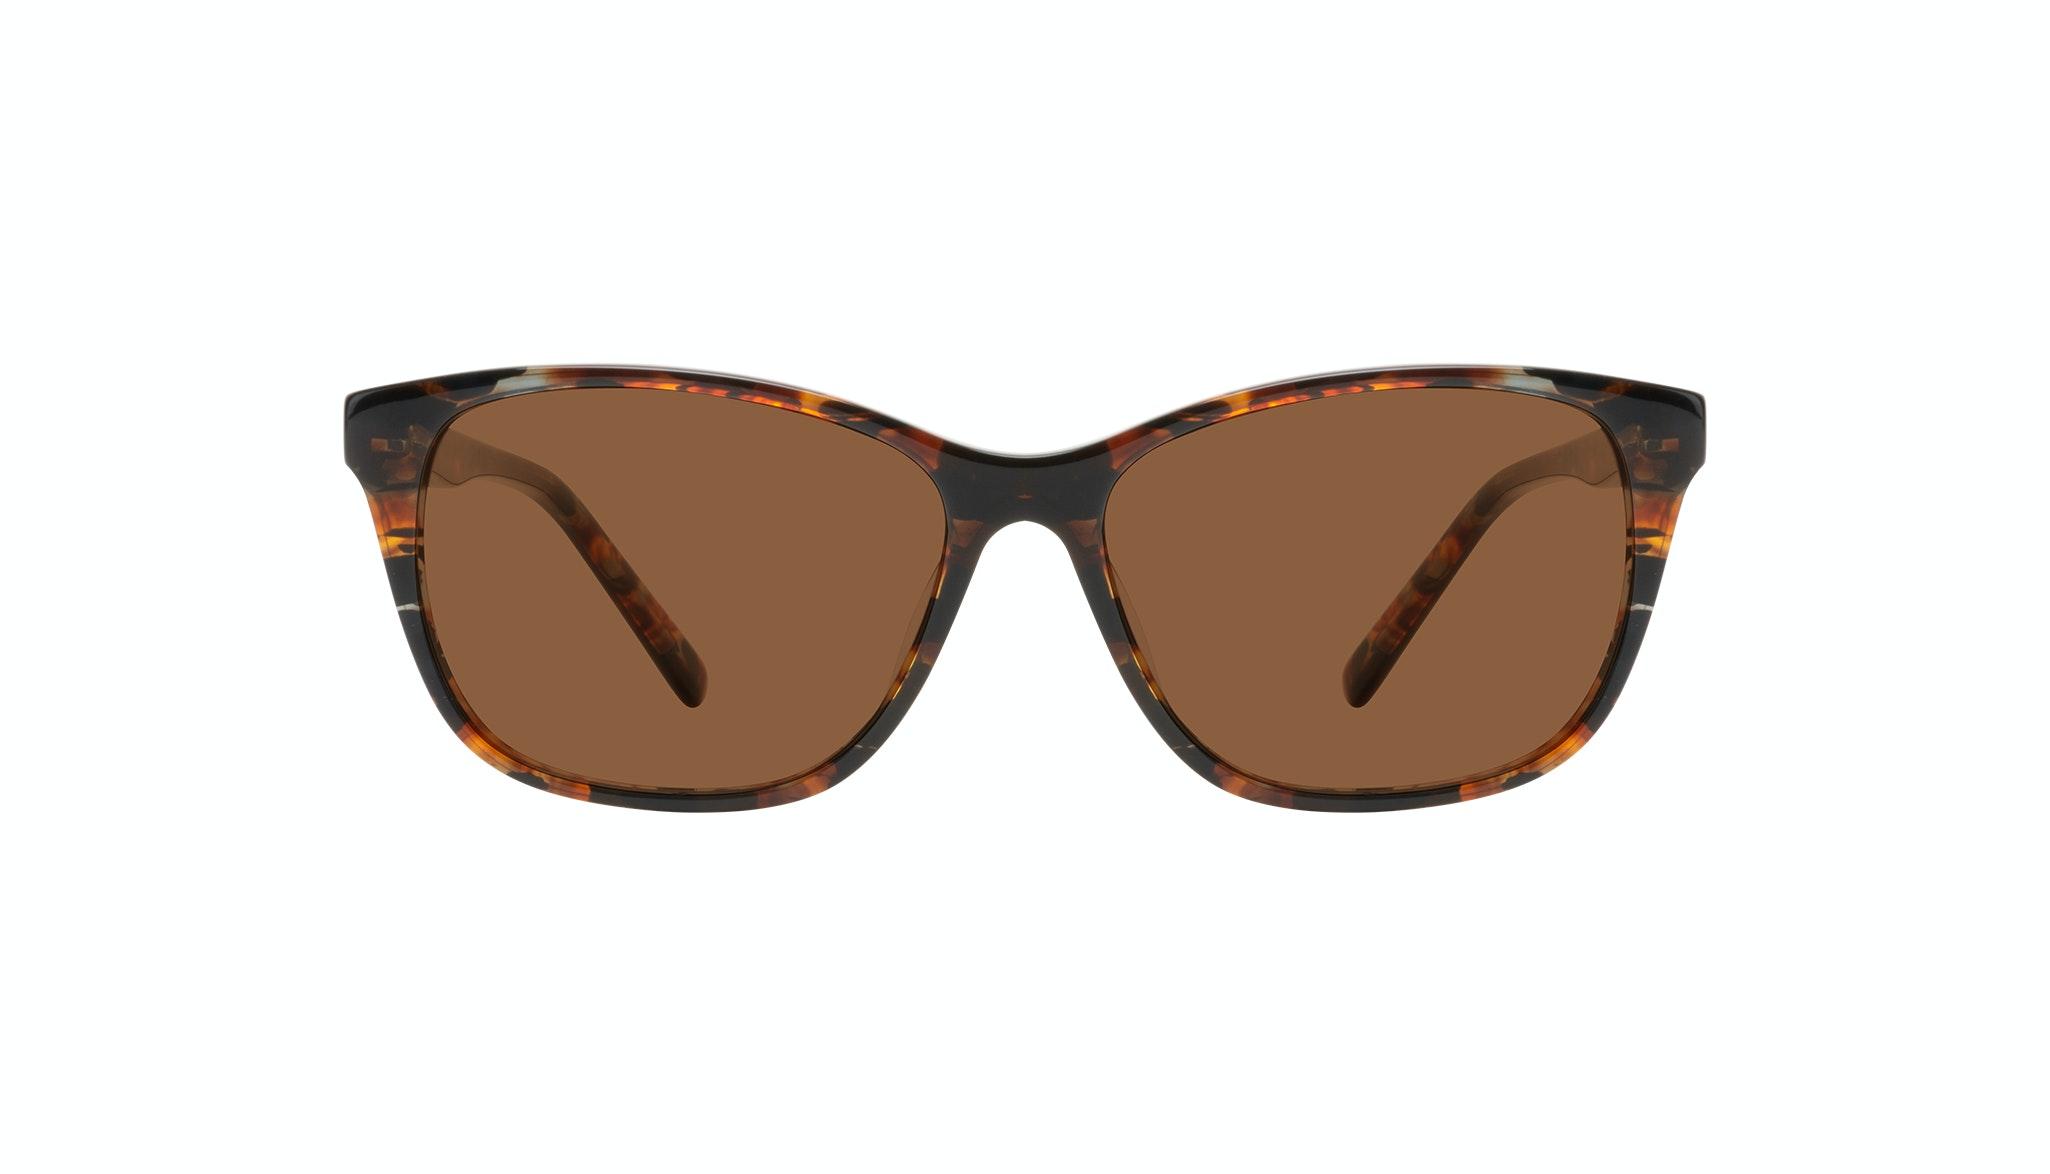 Affordable Fashion Glasses Cat Eye Sunglasses Women Myrtle Petite Mahogany